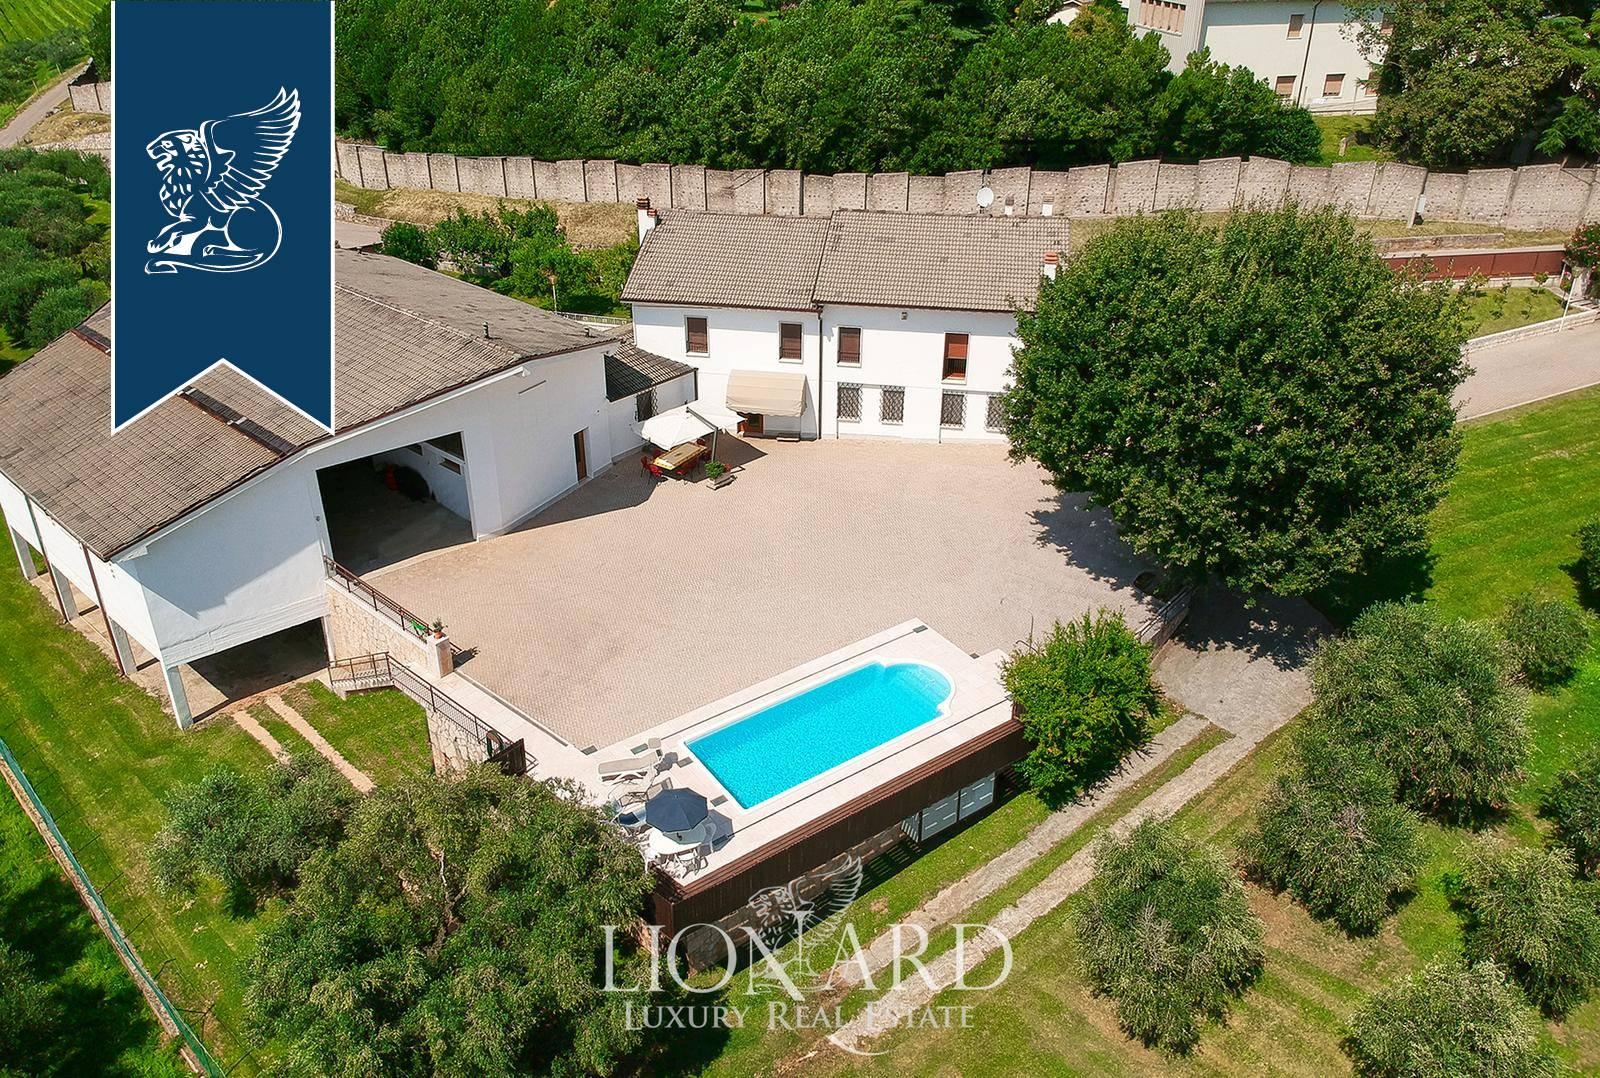 Villa in Vendita a Verona: 0 locali, 1000 mq - Foto 6